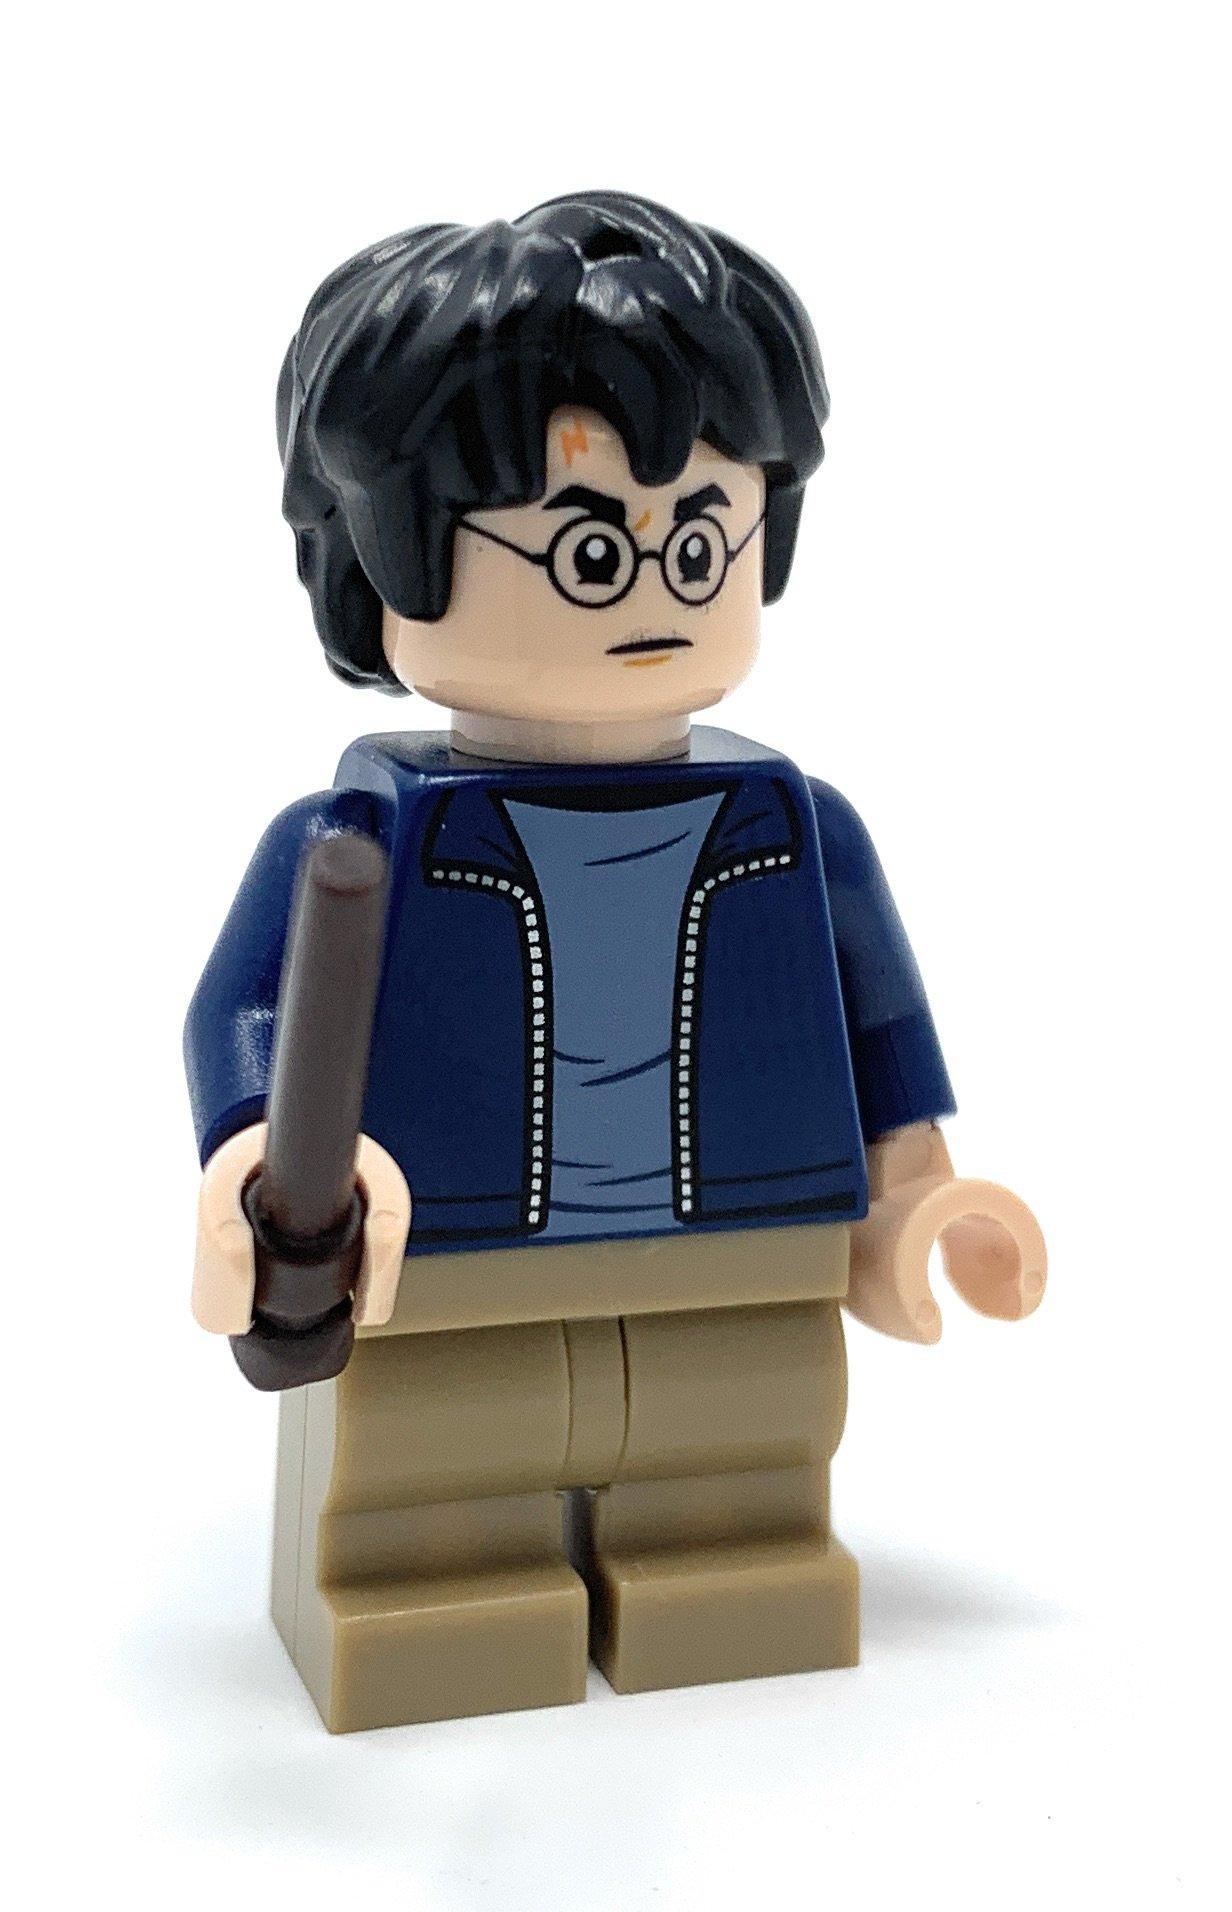 Lego Harry Potter And The Prisoner Of Azkaban Lego Harry Potter Harry Potter Movie Posters Lego Poster